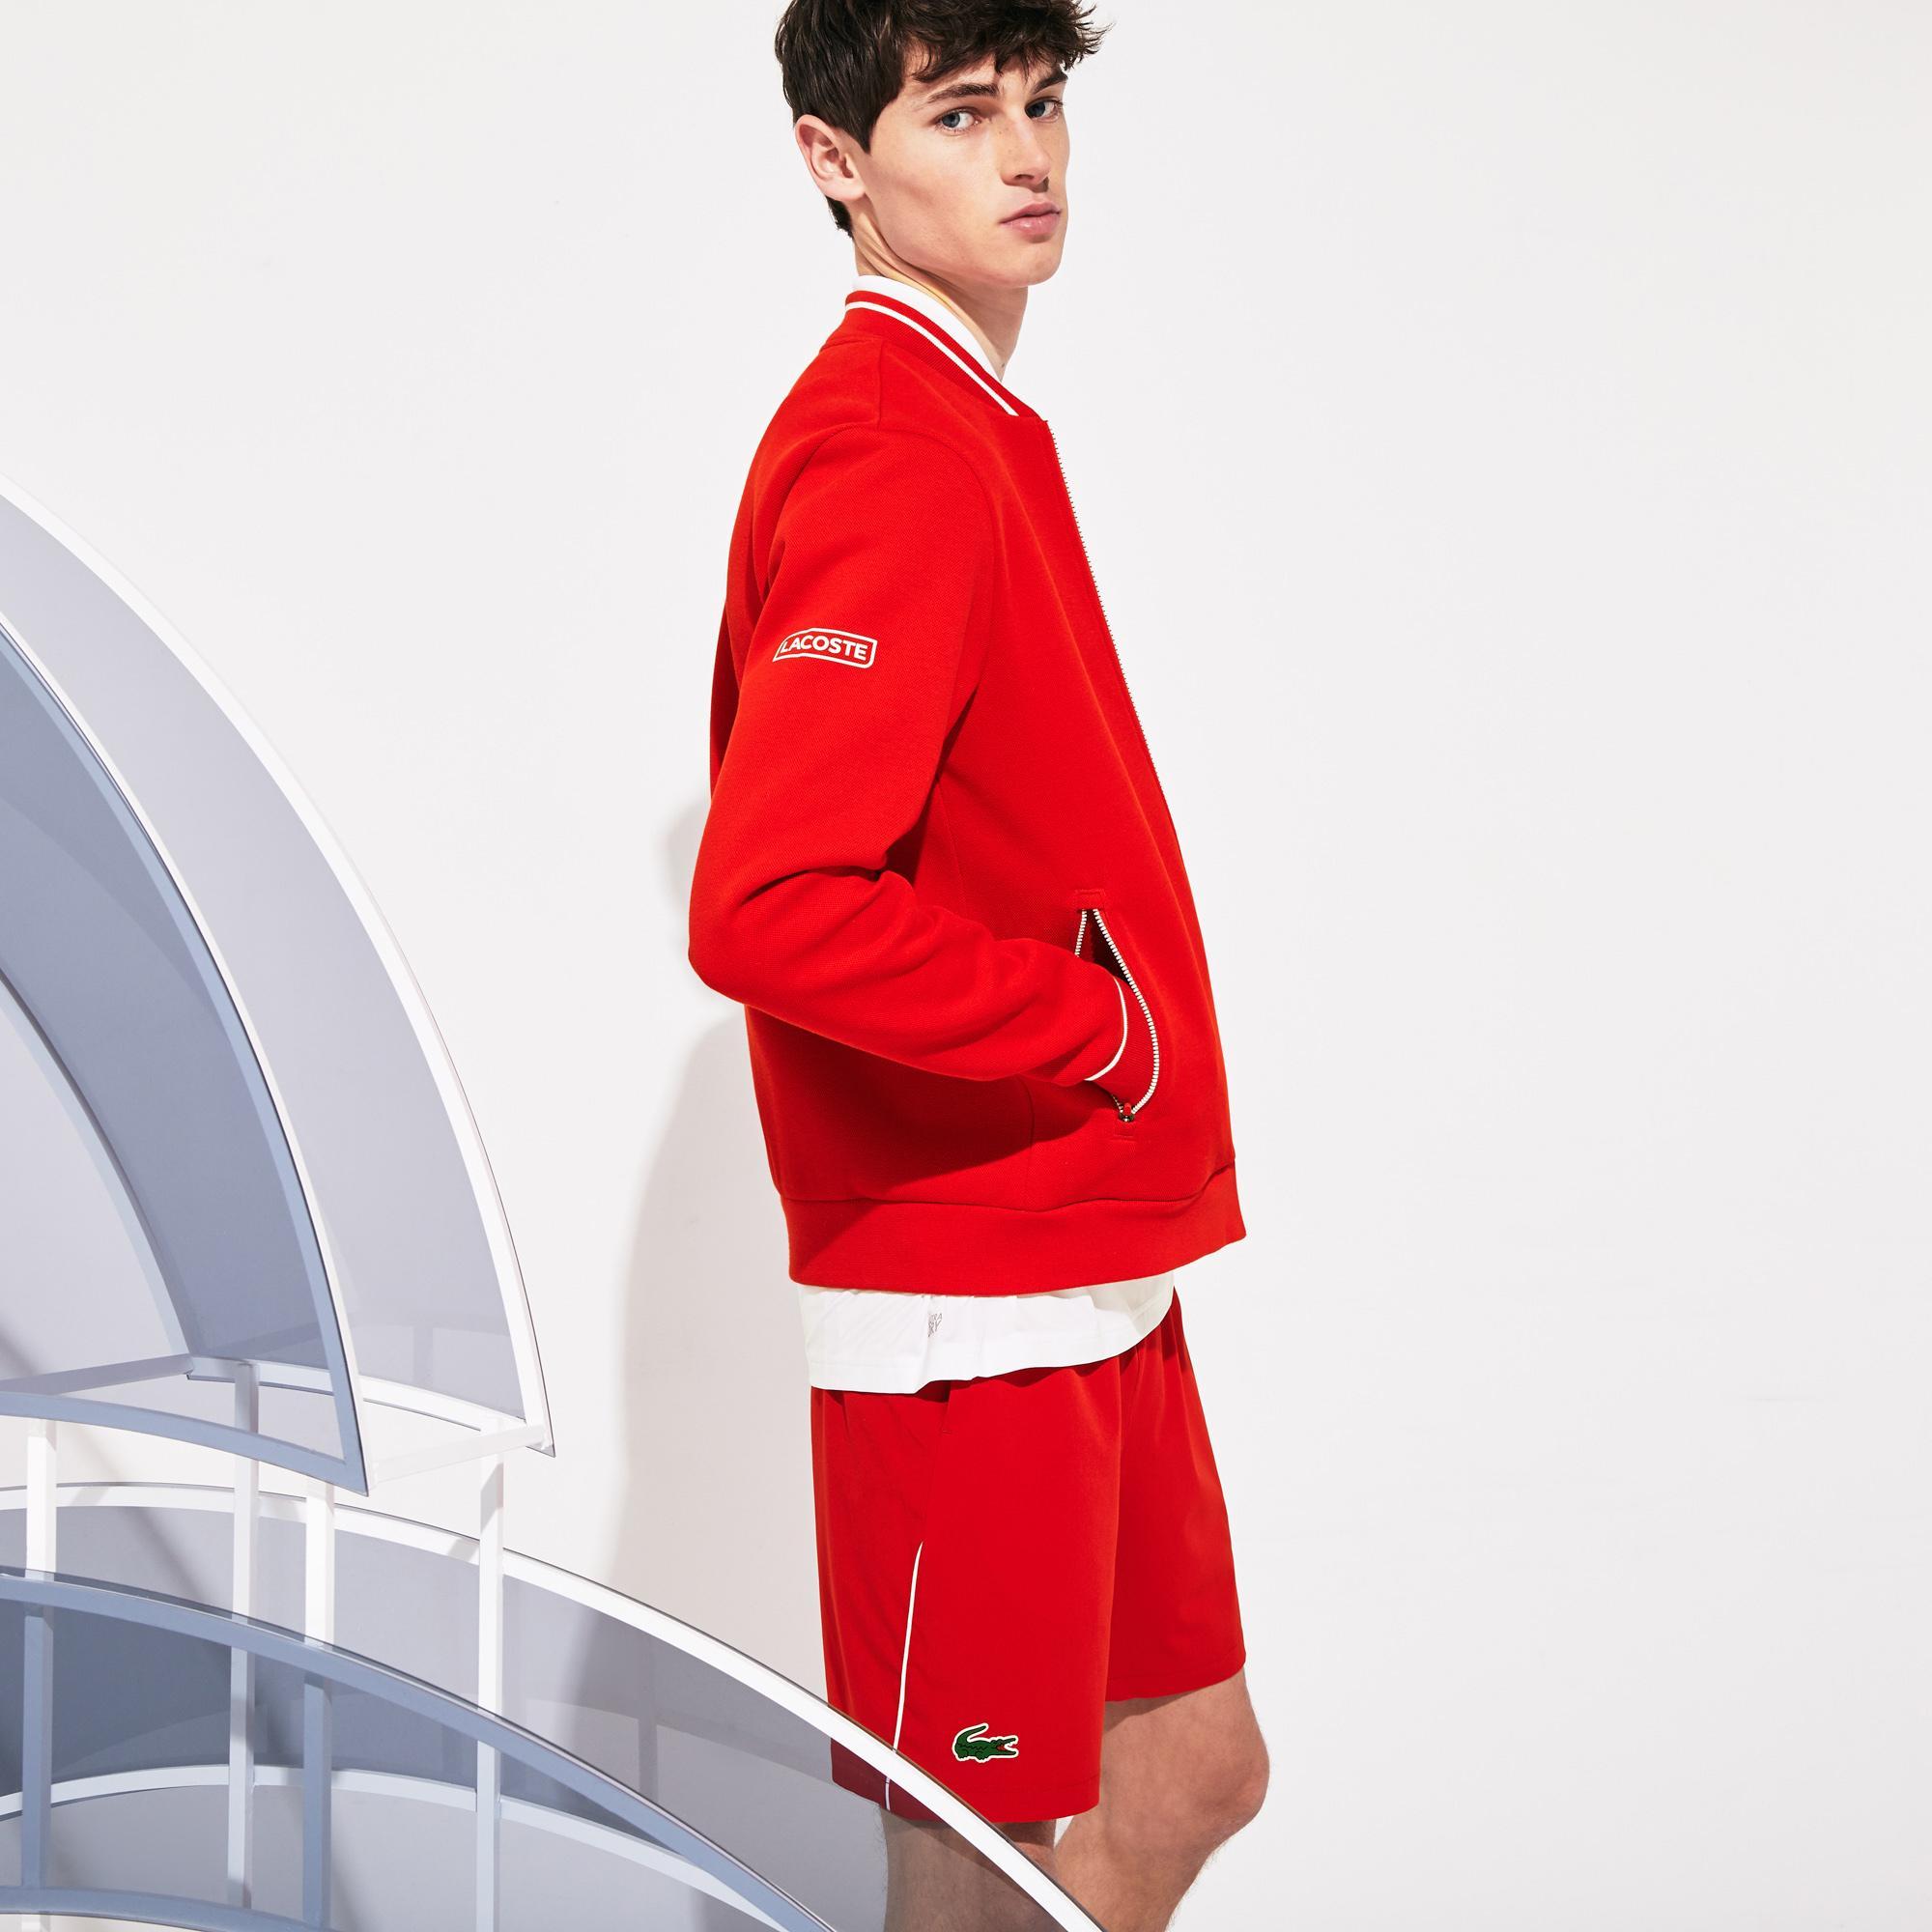 Lacoste Men's Sport Roland Garros X Novak Djokovic Jacket